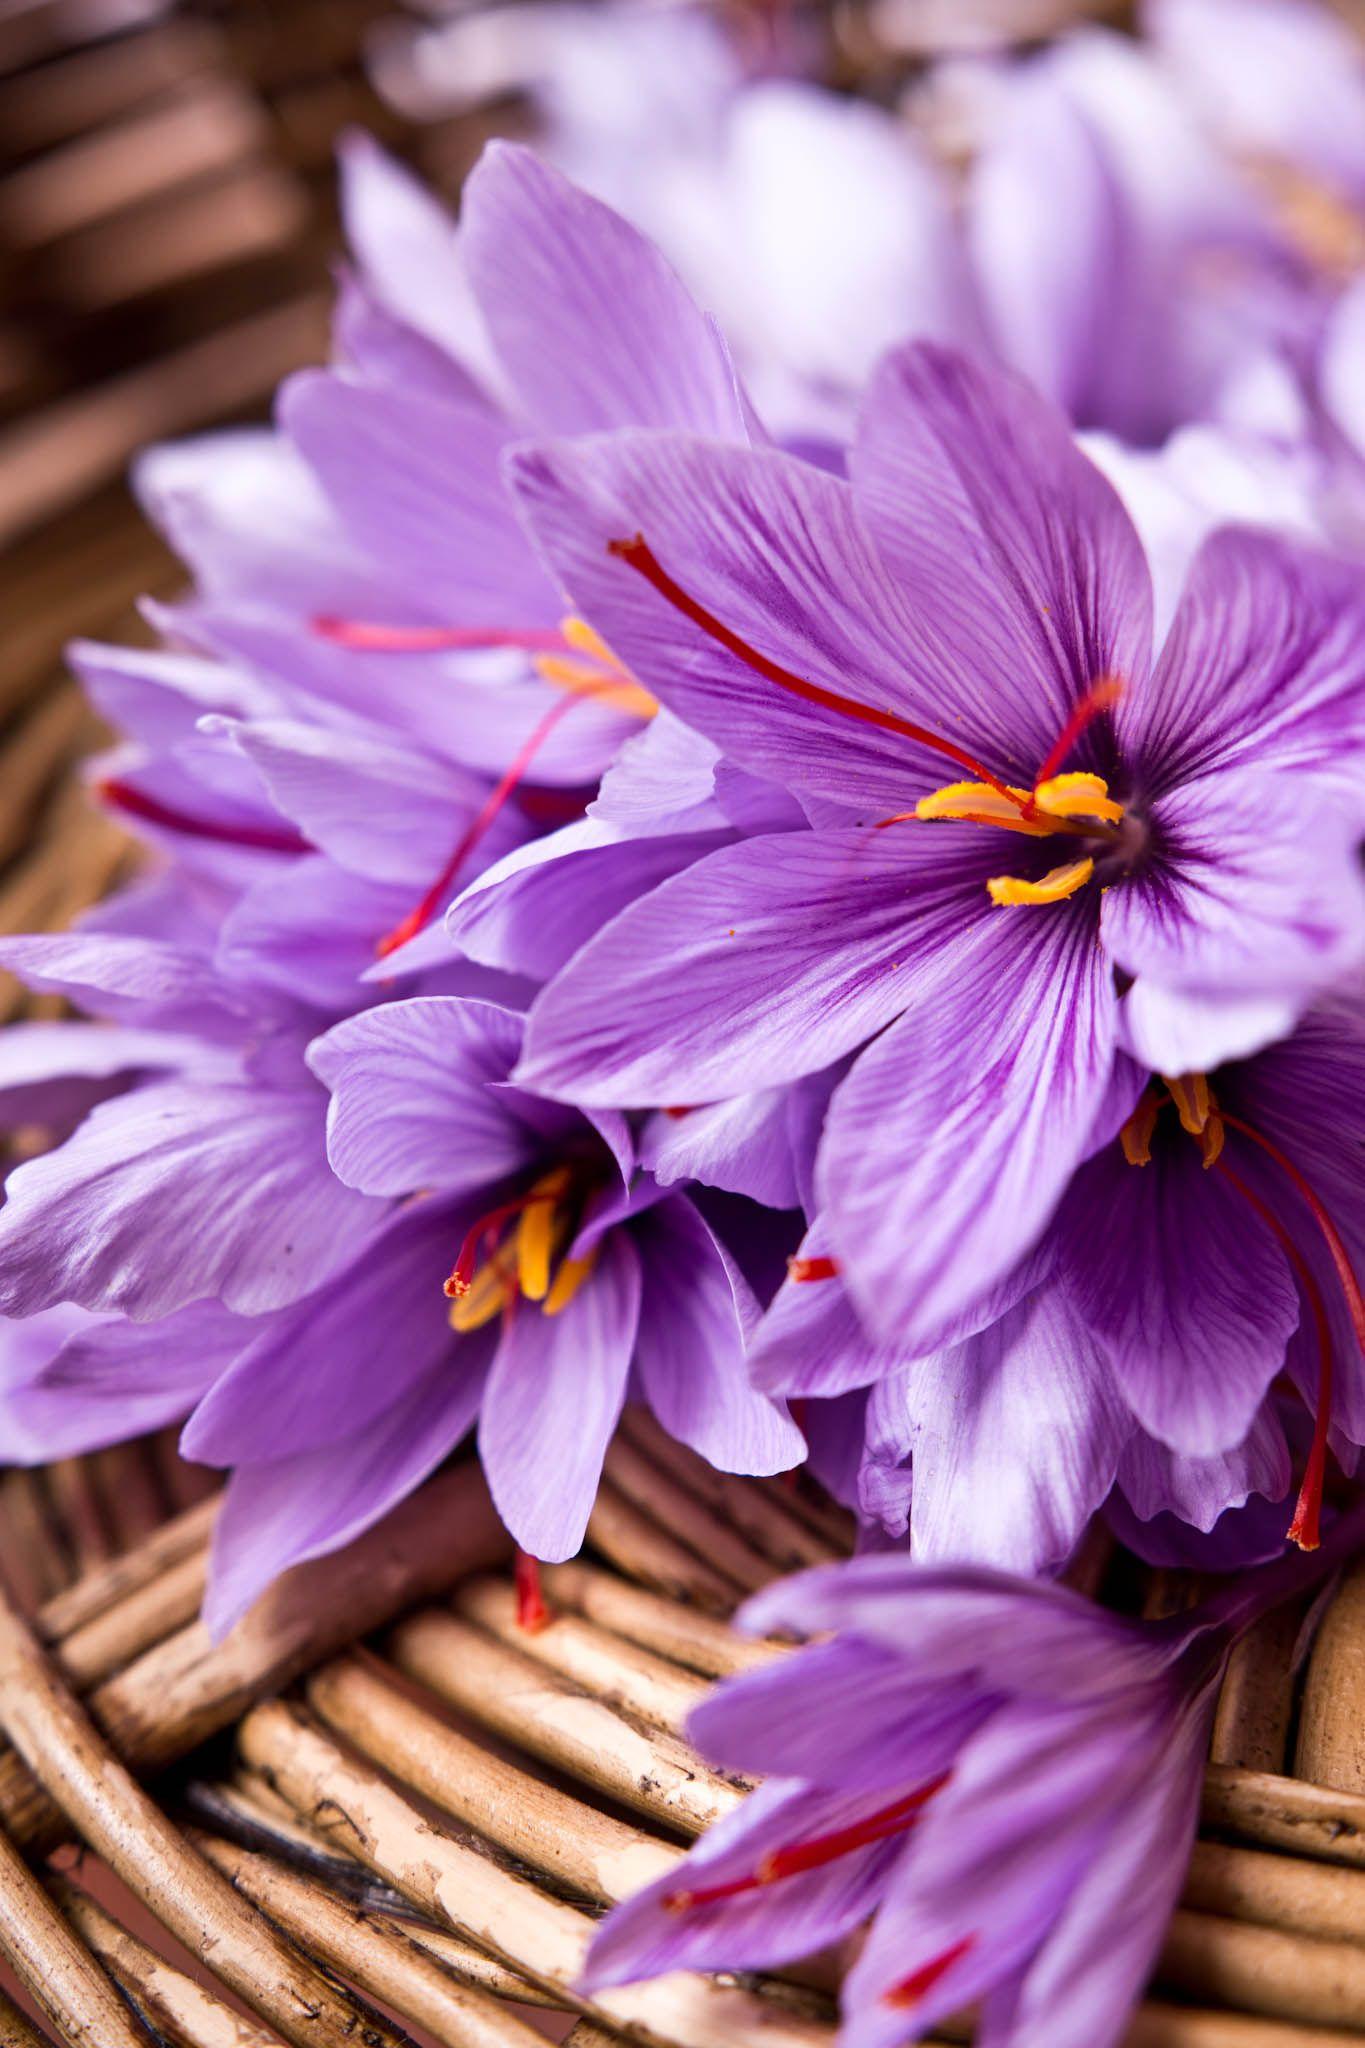 Freshly Collected Basket Of Saffron Crocus Sativus Flowers Grown